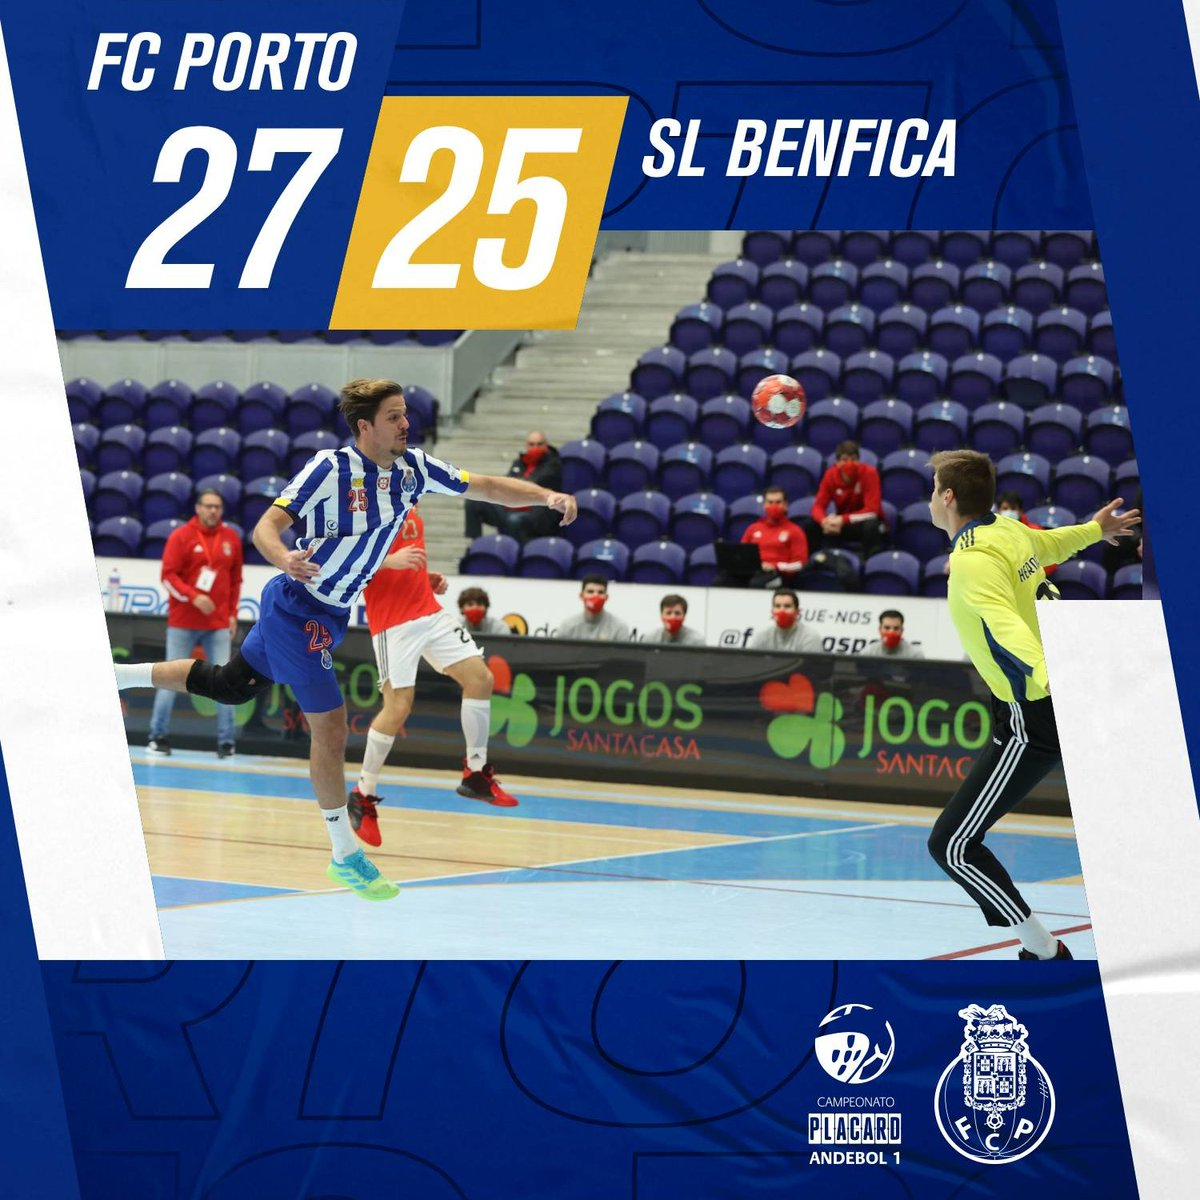 🤾♂️Vitória no Clássico!🤾♂️   💪Única equipa invicta no Campeonato de Andebol  💙Vamos, Dragões!  #FCPorto #FCPortoAndebol #Andebol #FCPortoSports https://t.co/9N9rZJcyIq